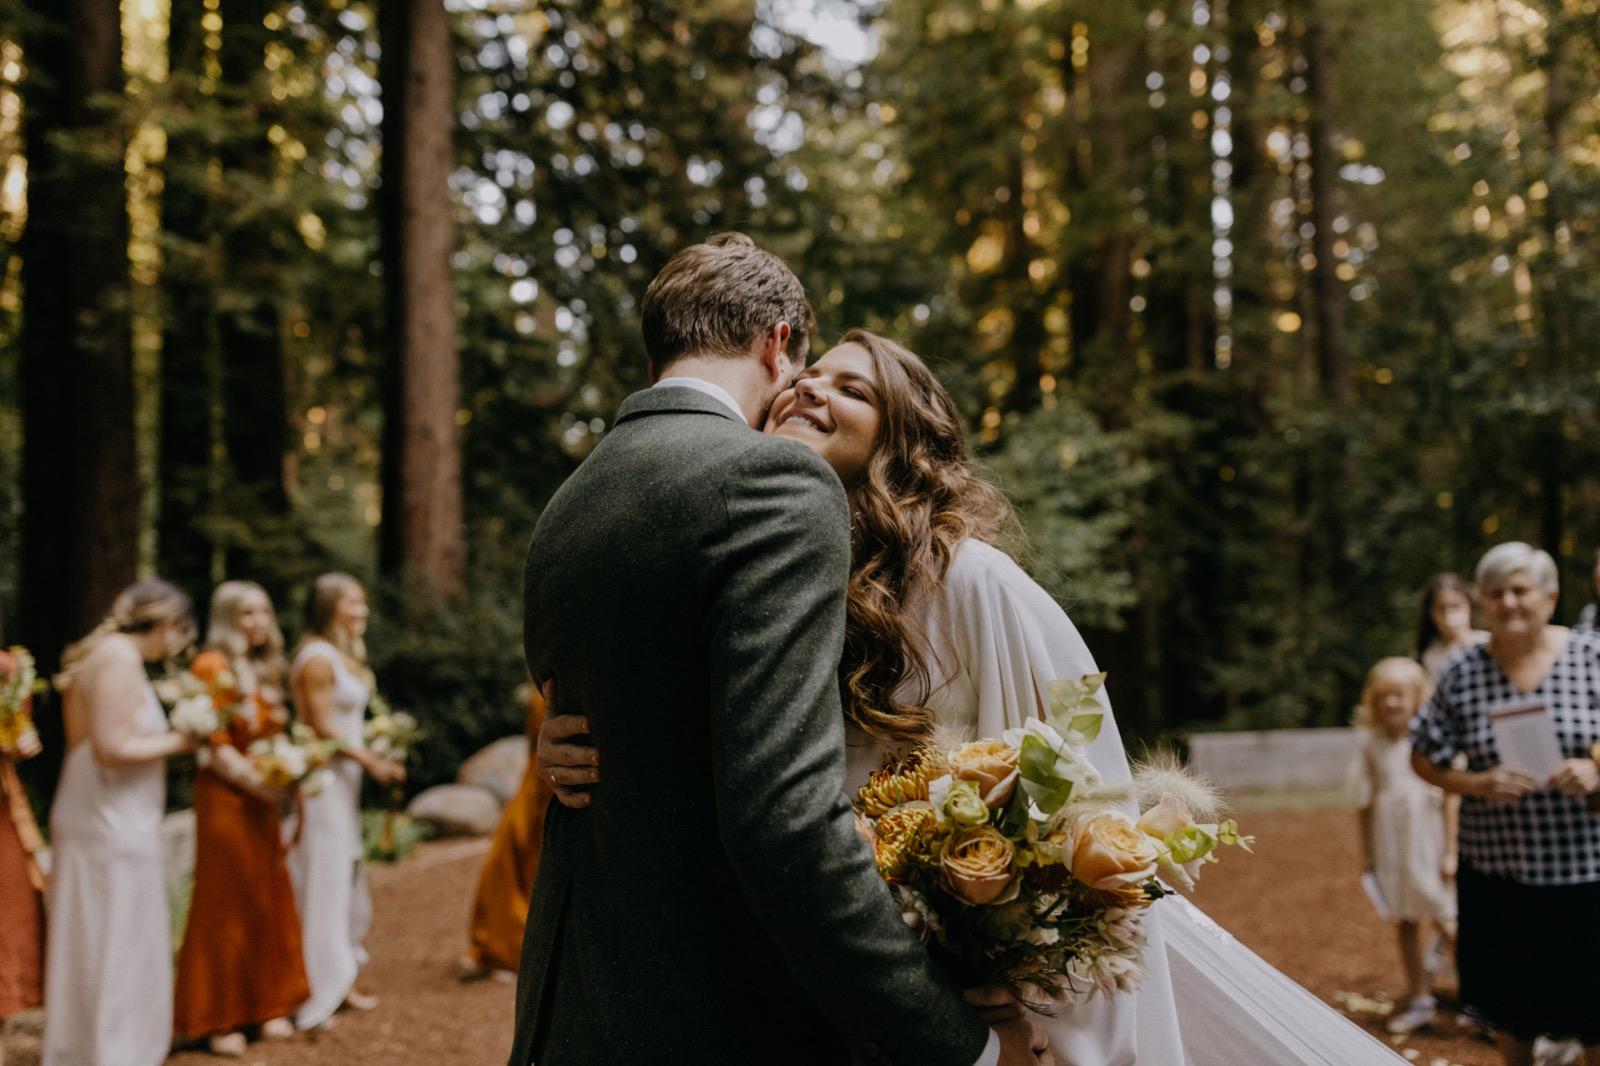 061_Emily & Jeff Wedding 0608_the-waterfall-lodge_forest_wedding_ben-lomond_intimate